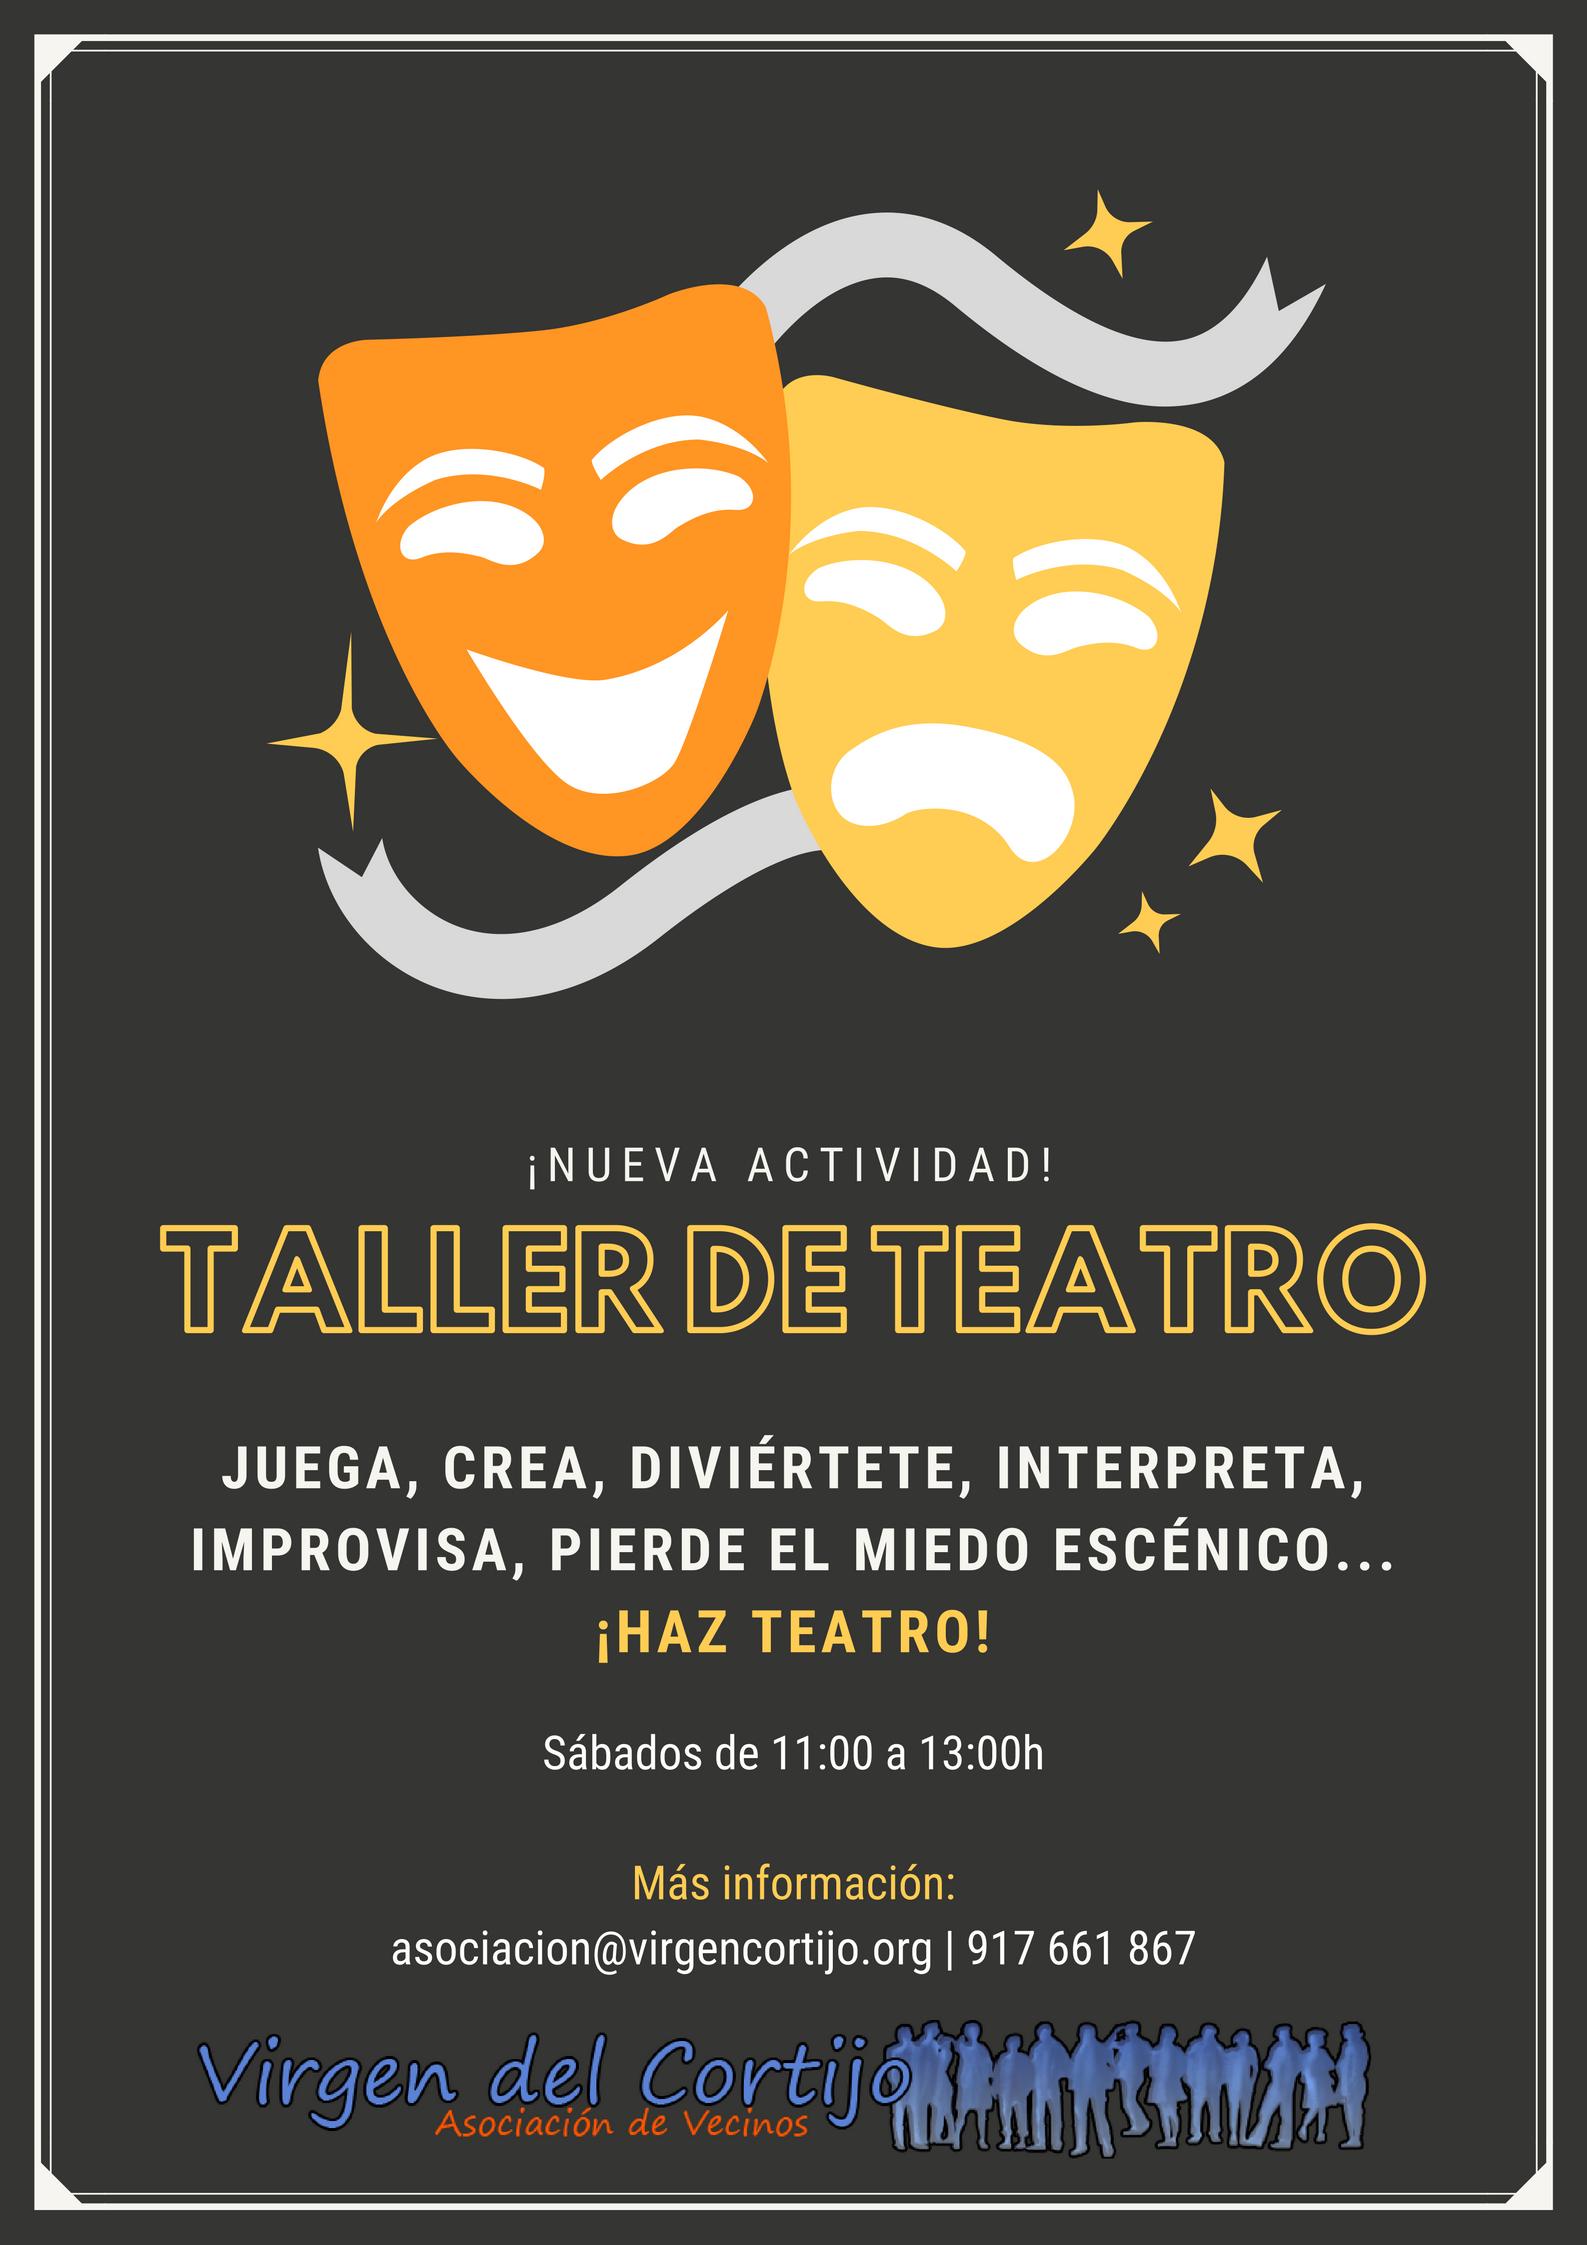 CT - Taller teatro